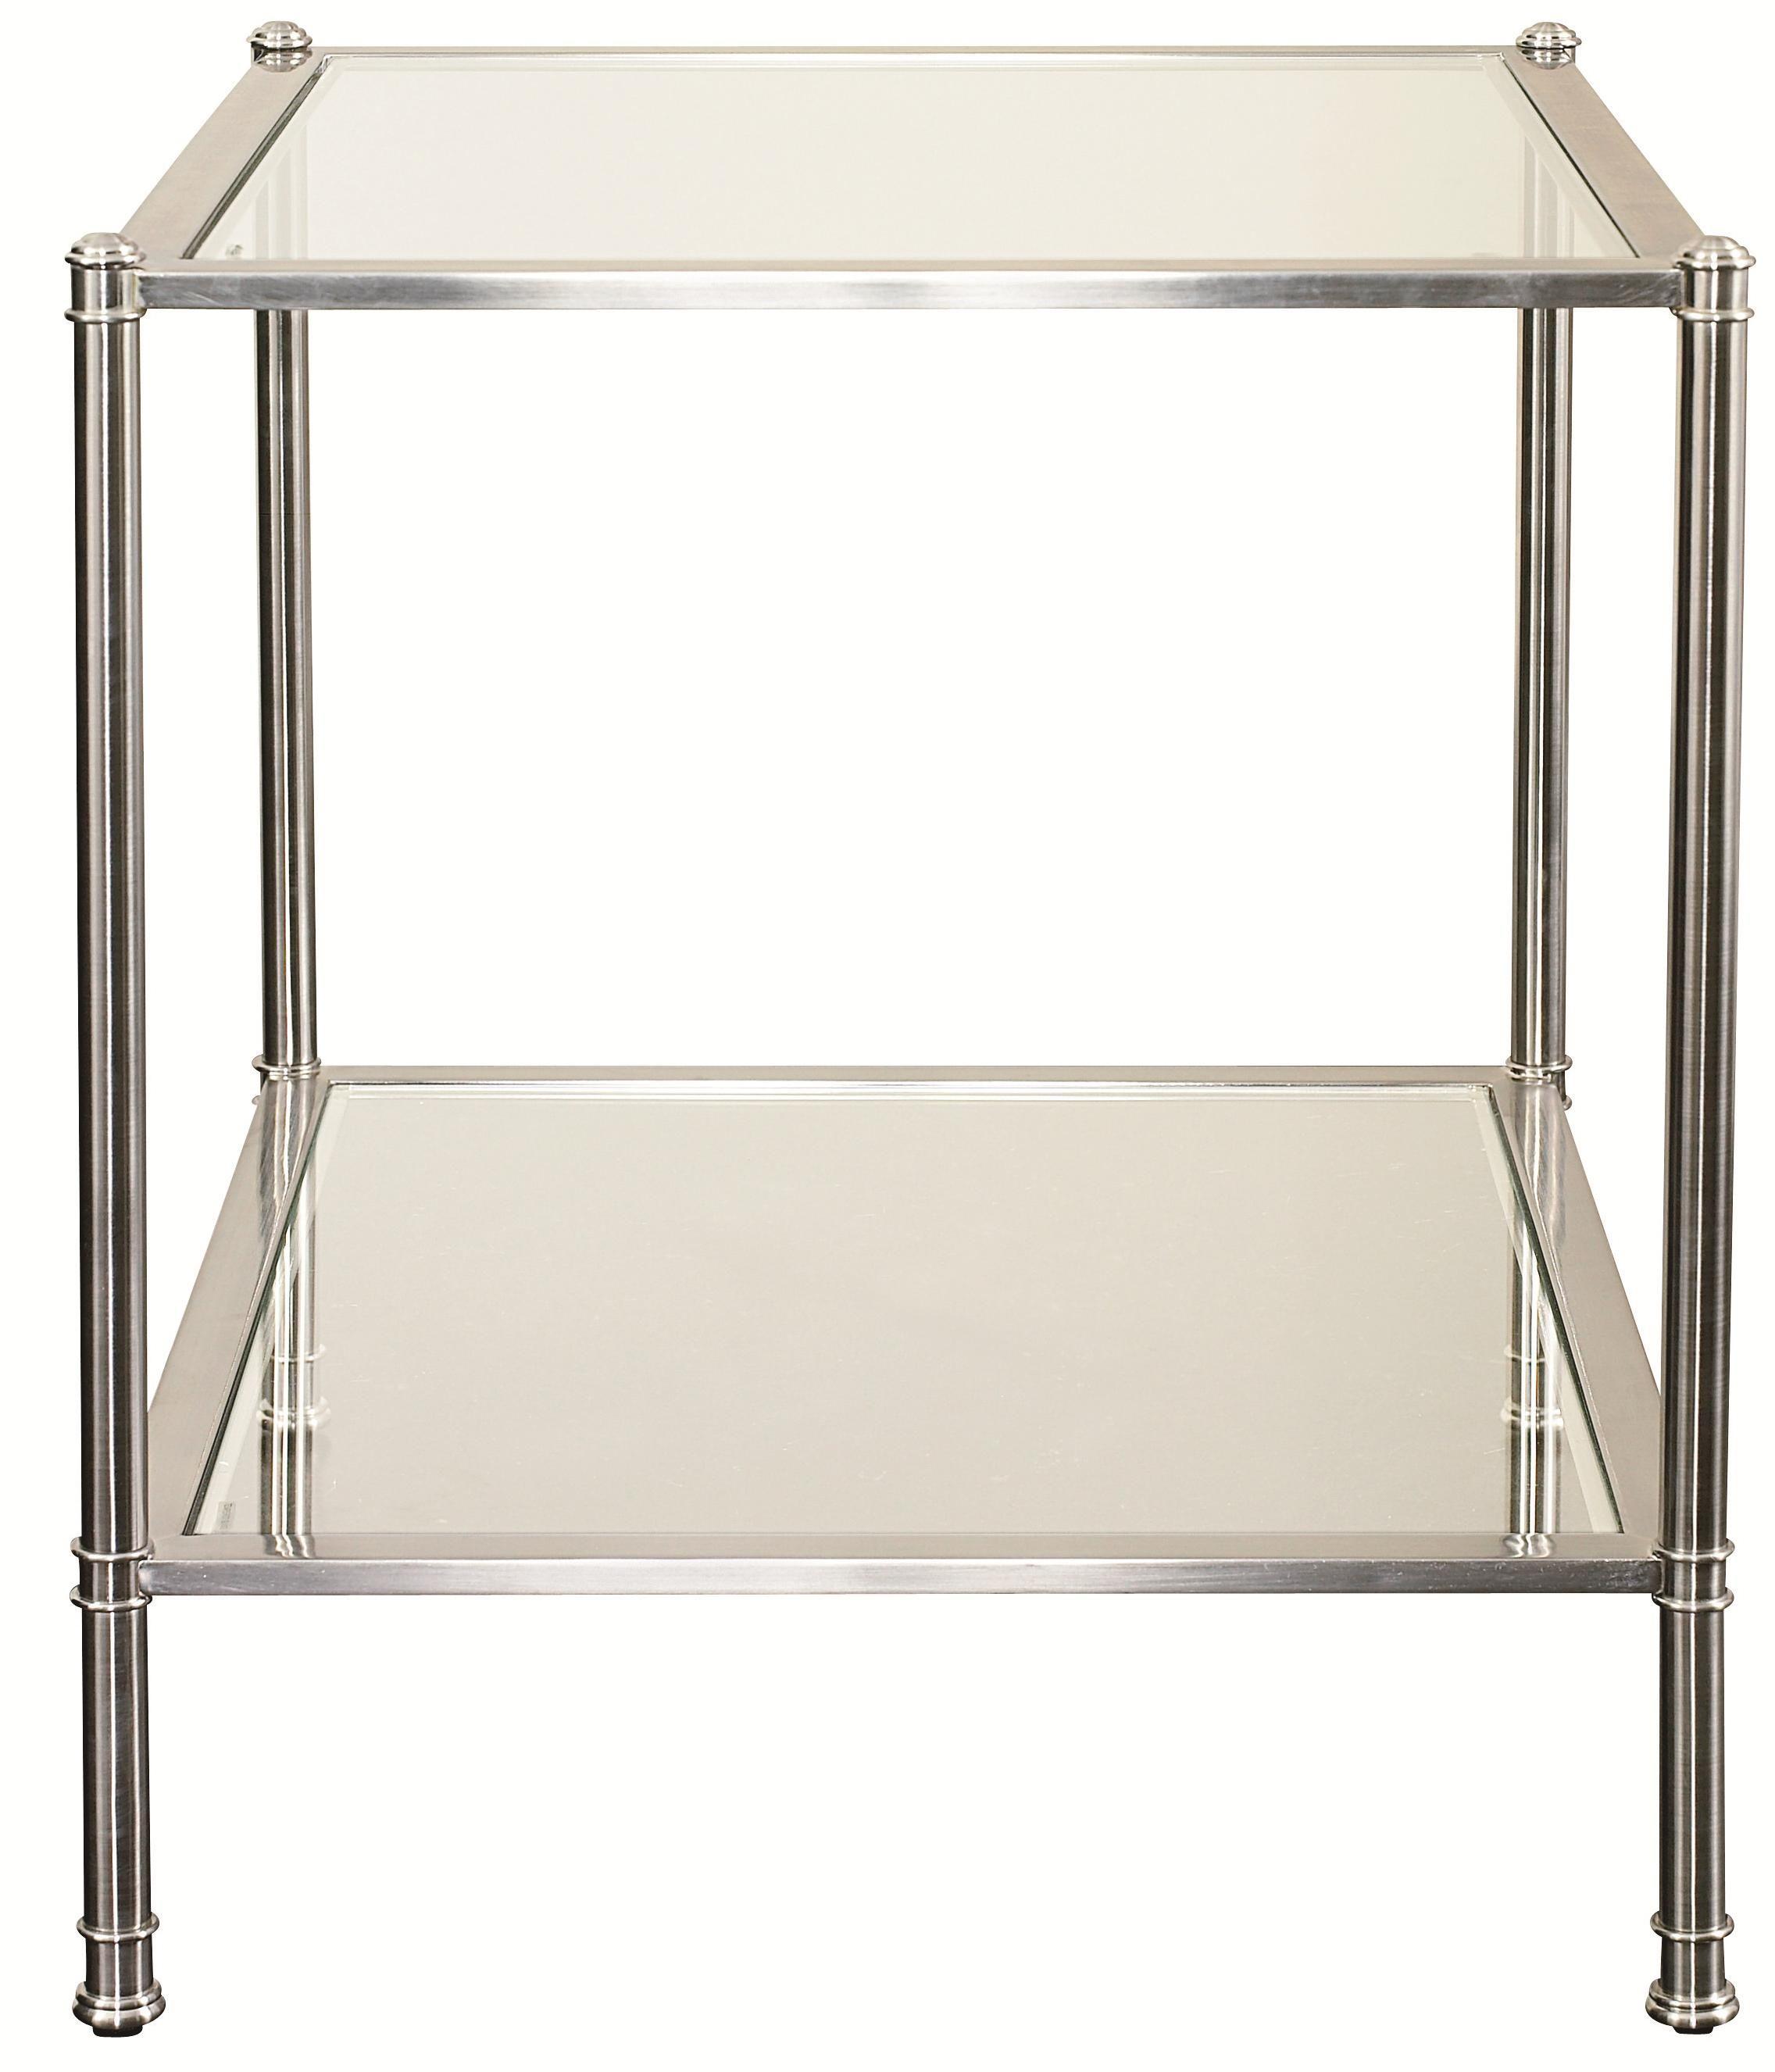 Metropolitan End Table by Bassett Hudson furniture